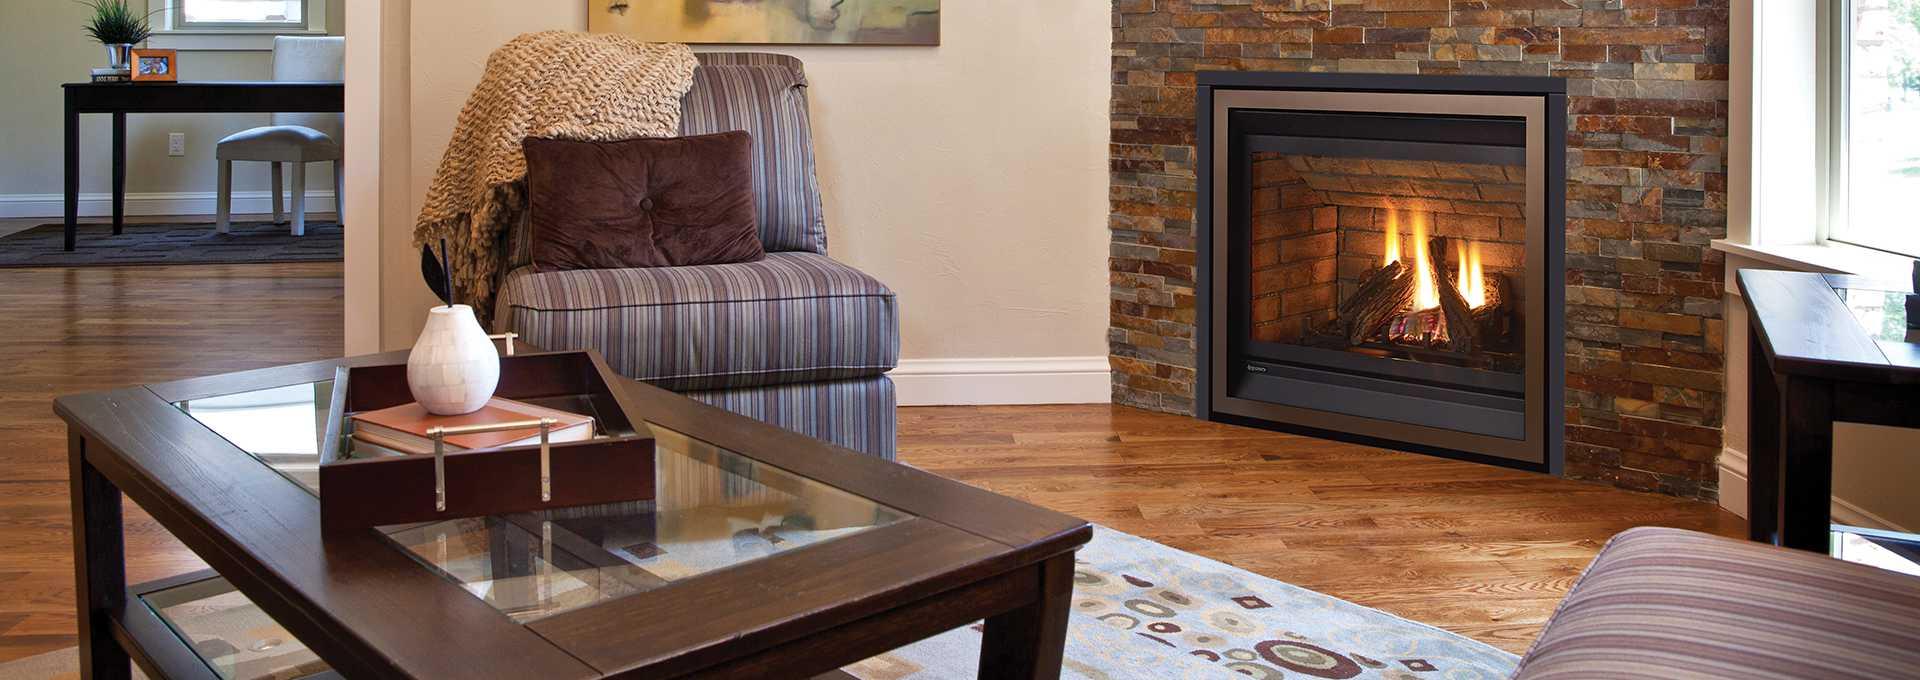 Who Repairs Gas Fireplaces Beautiful Fireplaces toronto Fireplace Repair & Maintenance